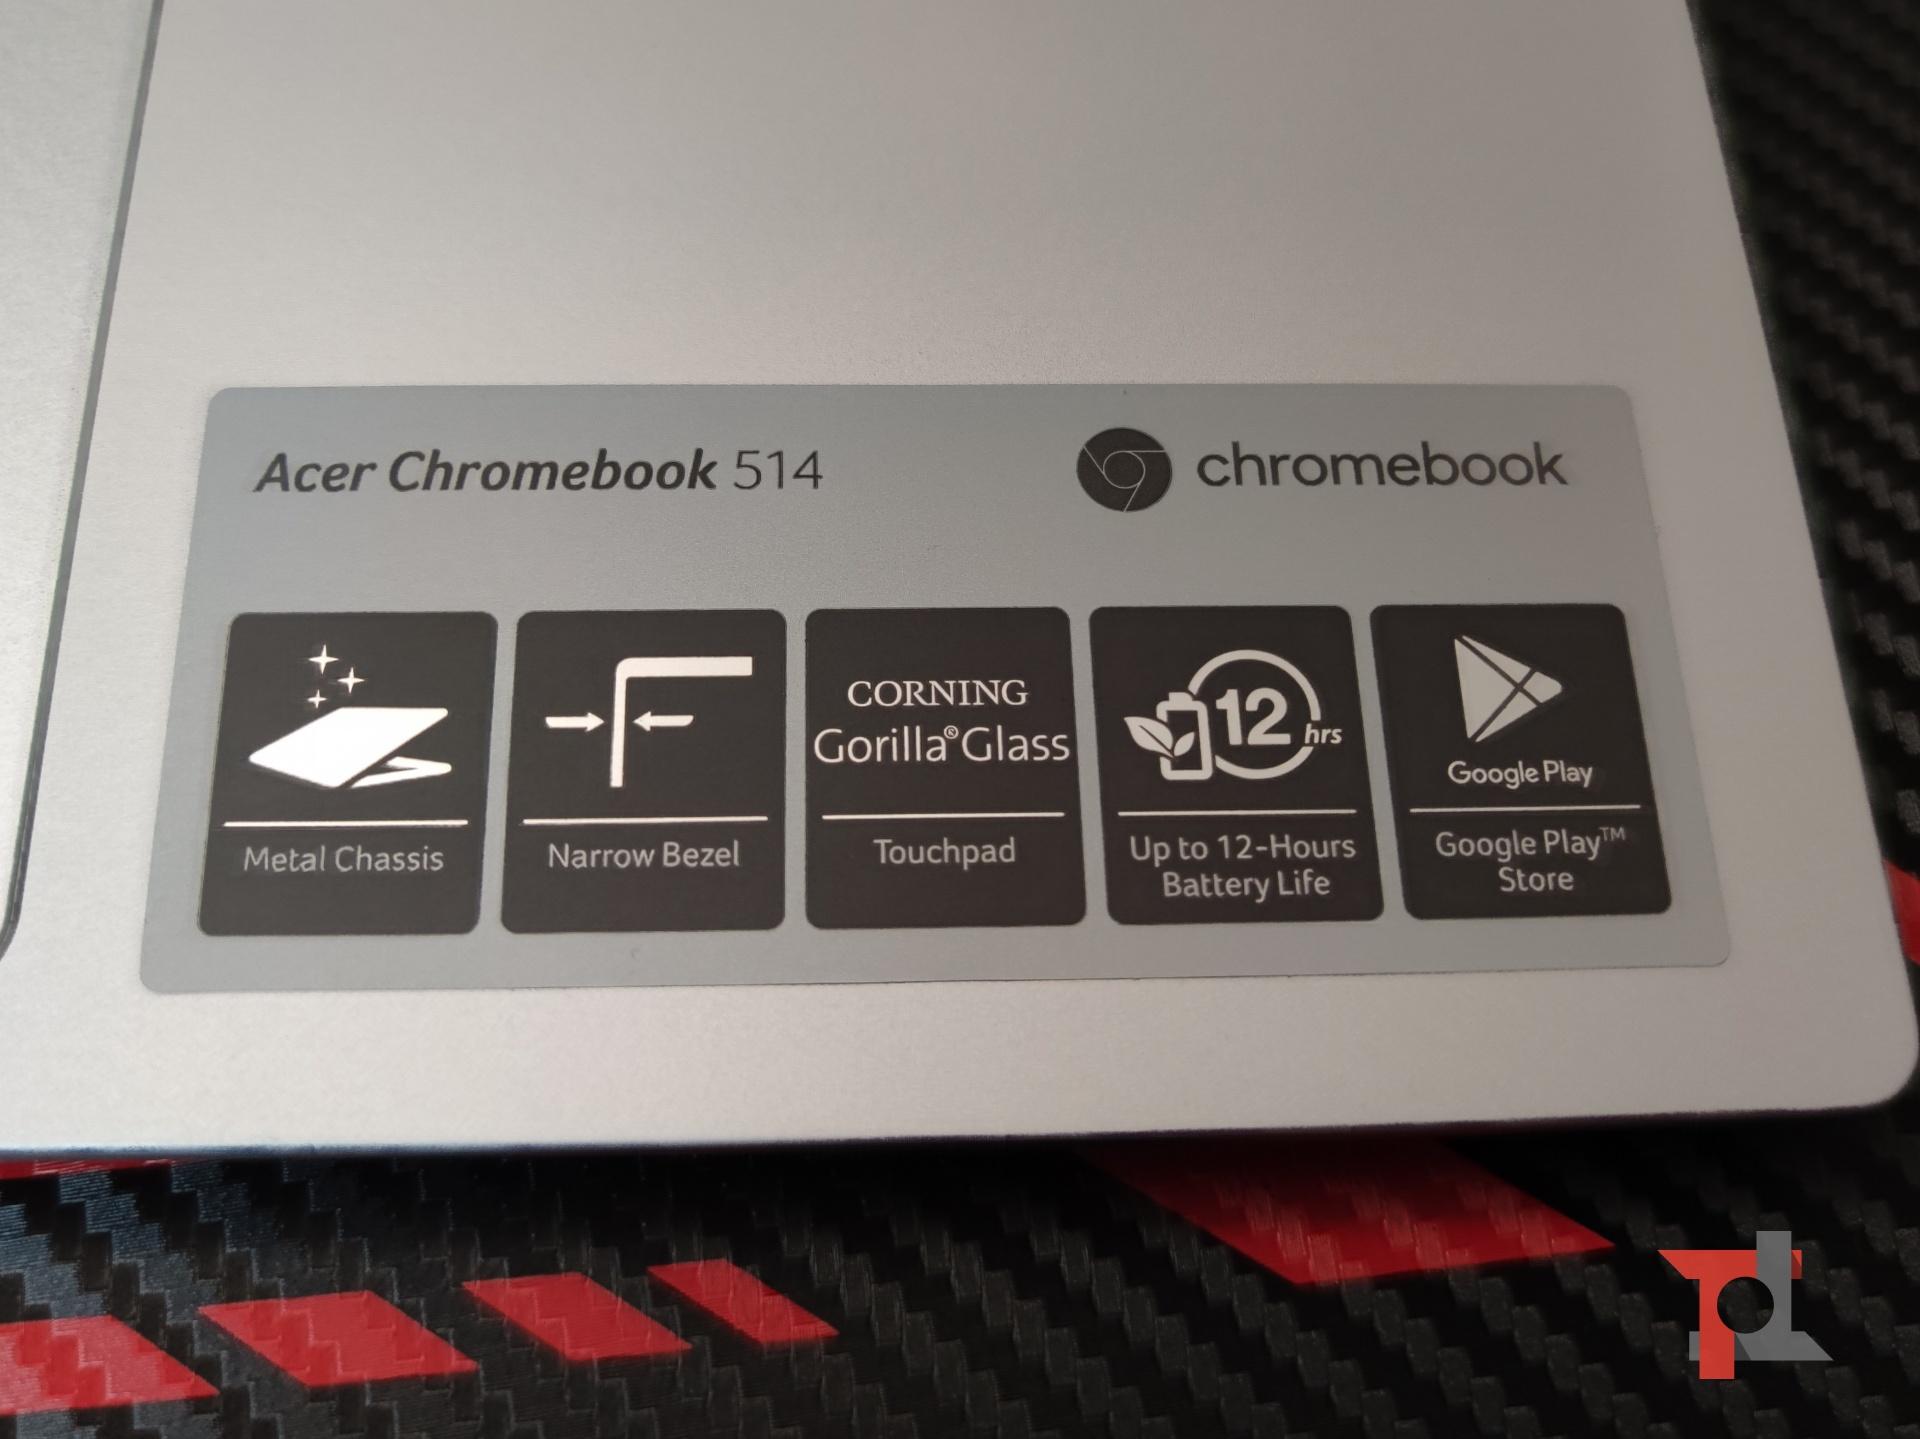 Recensione Acer Chromebook 514: può un Chromebook sostituire un classico notebook? 7